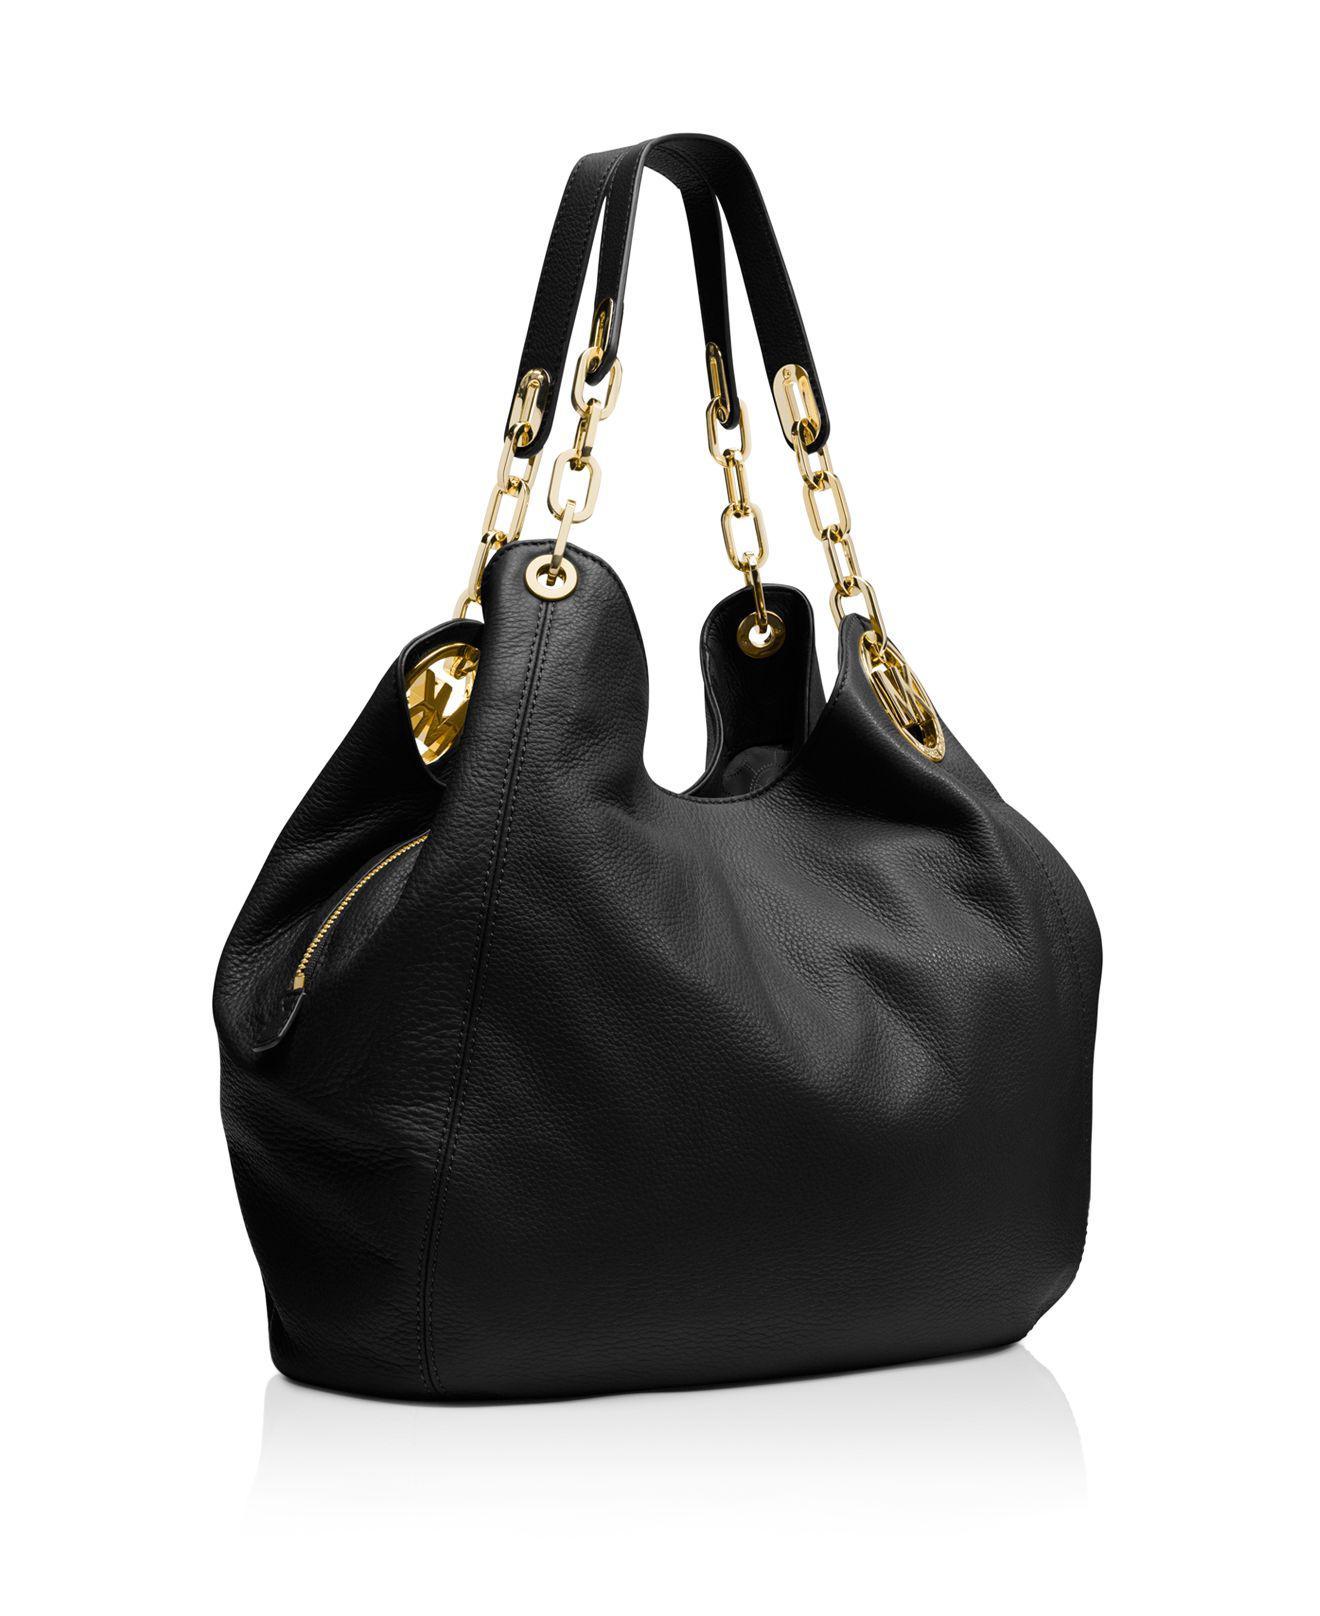 f15872b6b676 Large Fulton Black Bag With Silver Hardware. Lyst - Michael Kors Fulton  Medium Shoulder ...